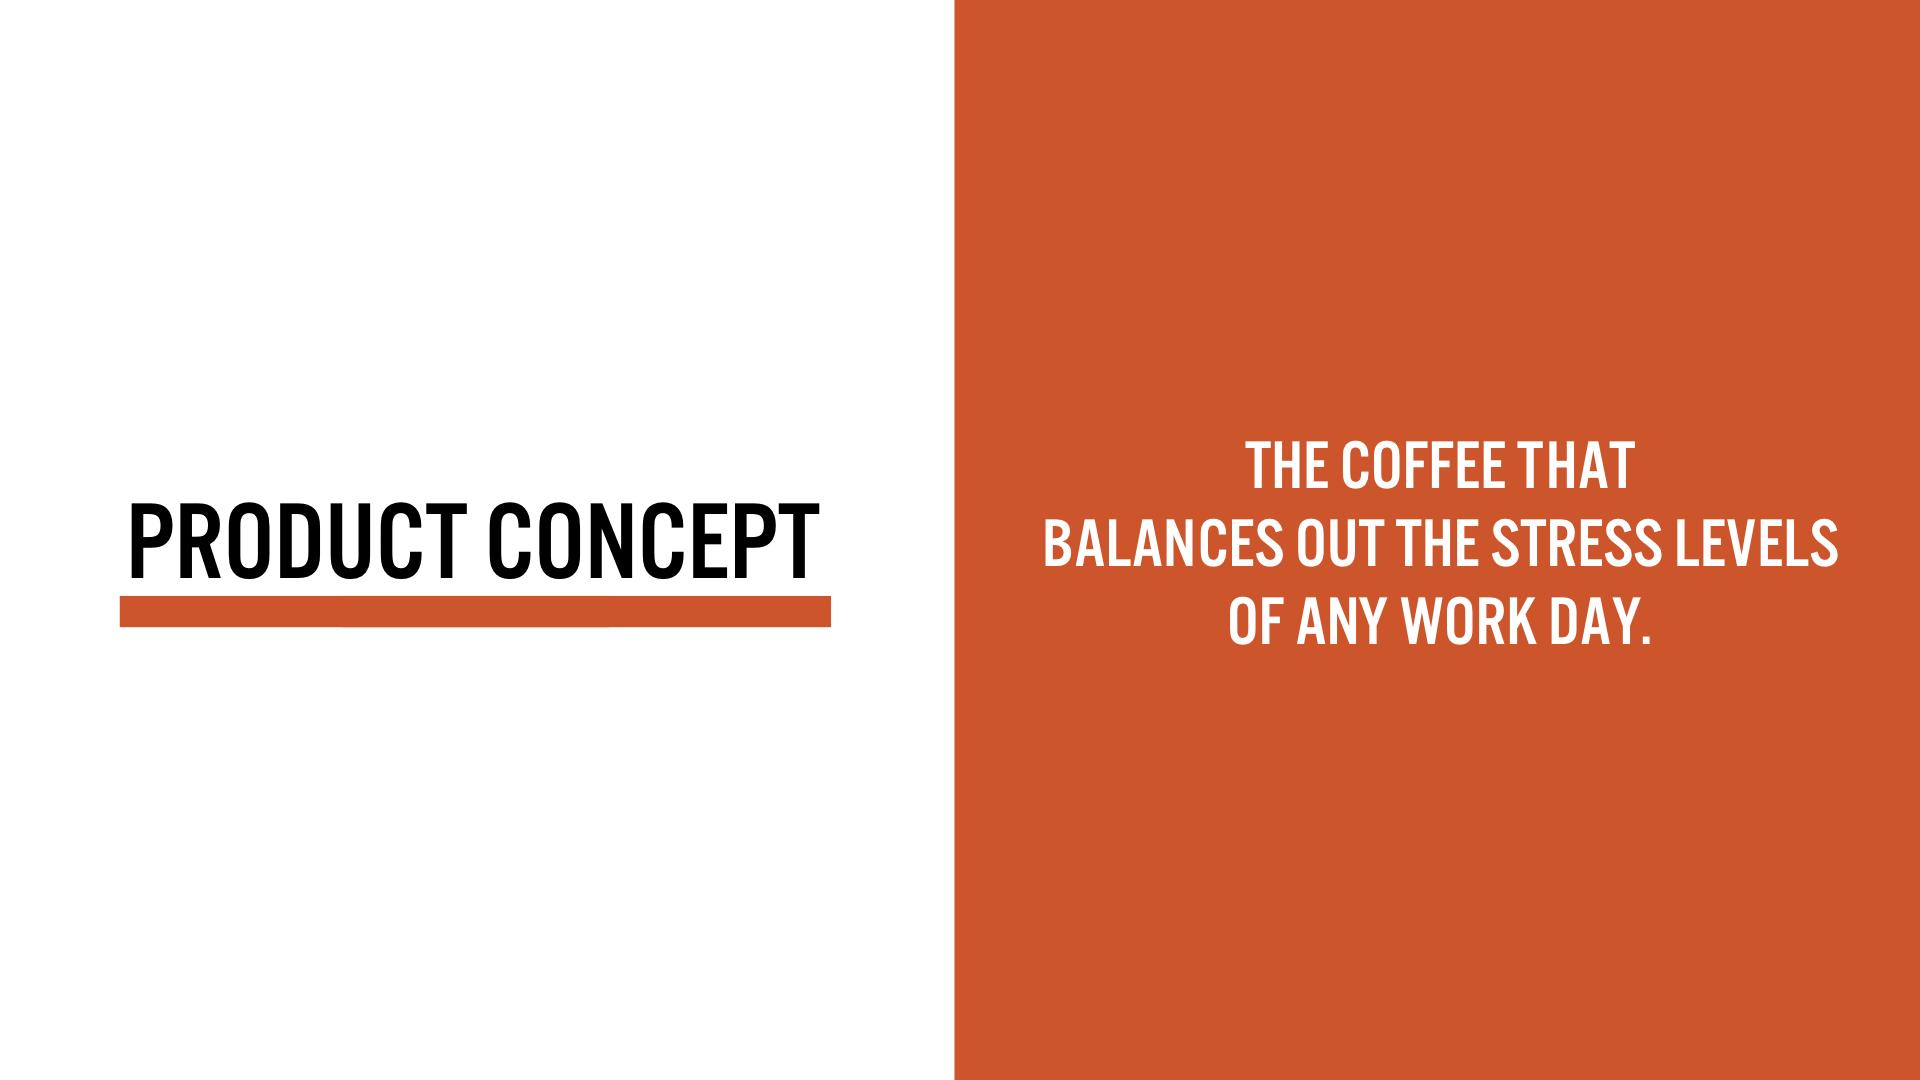 WORK COFFEE PRESENTATION FINAL.033.jpeg